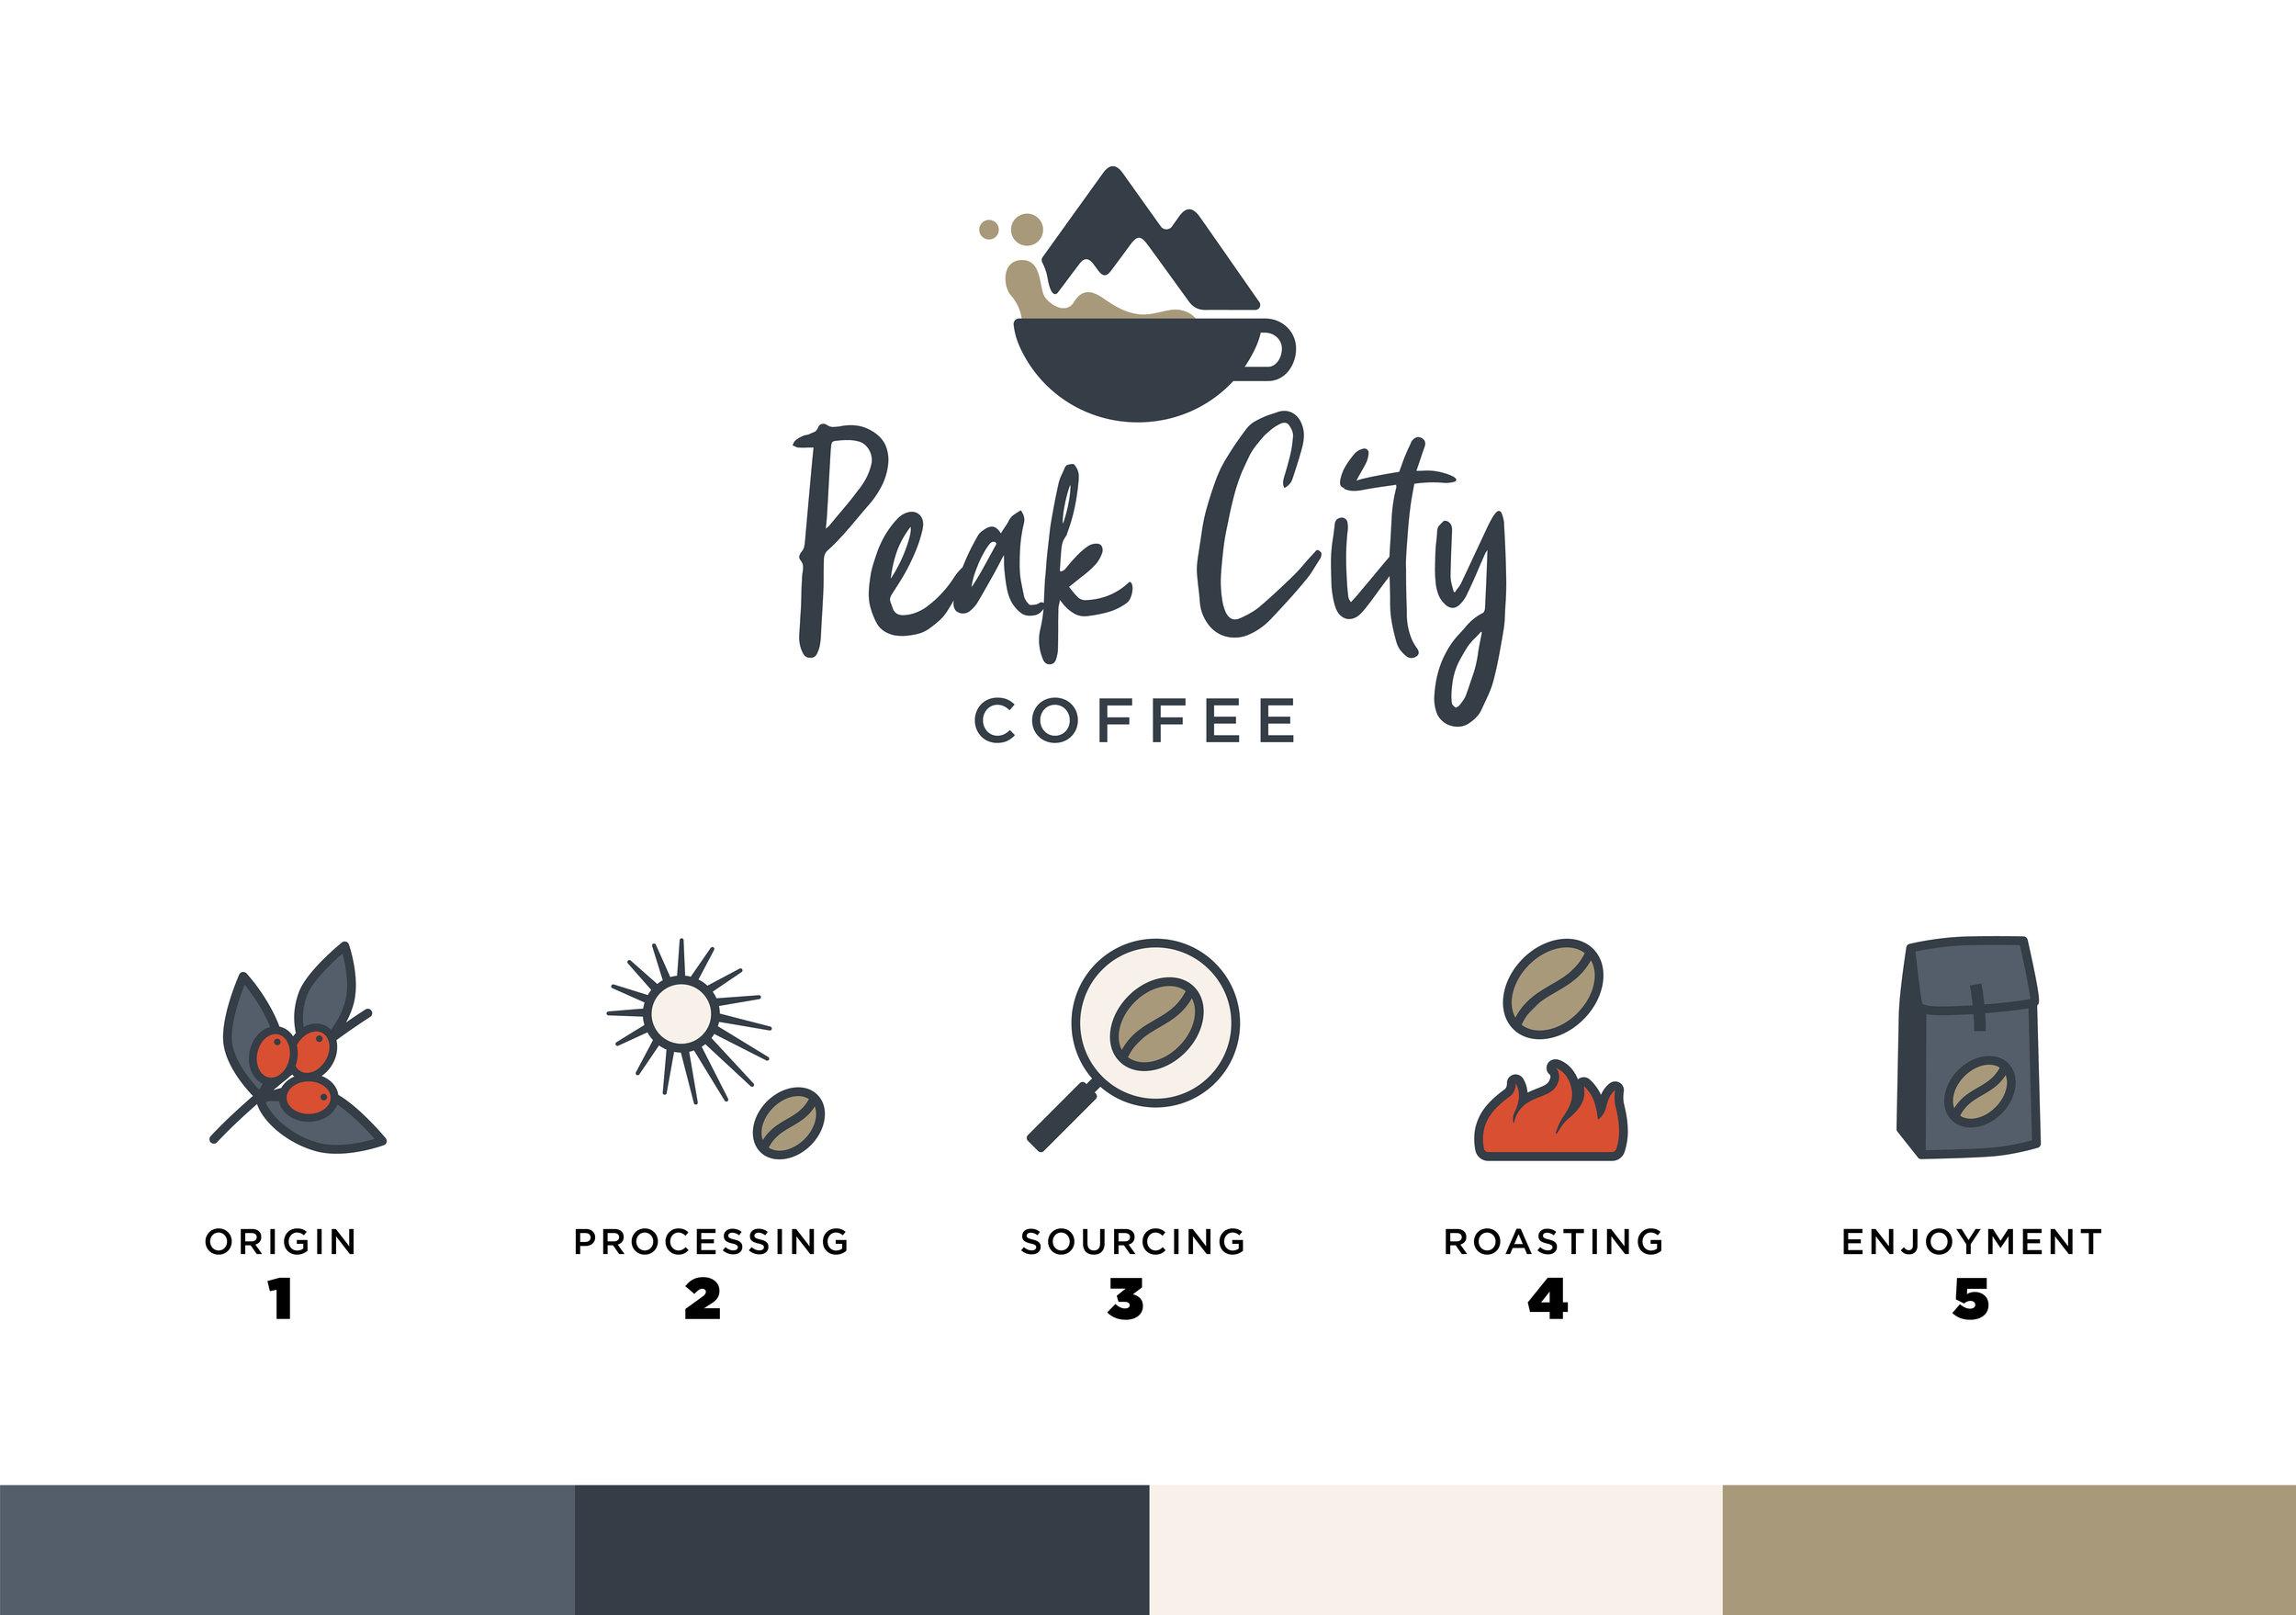 Peak City Coffee icons.jpg